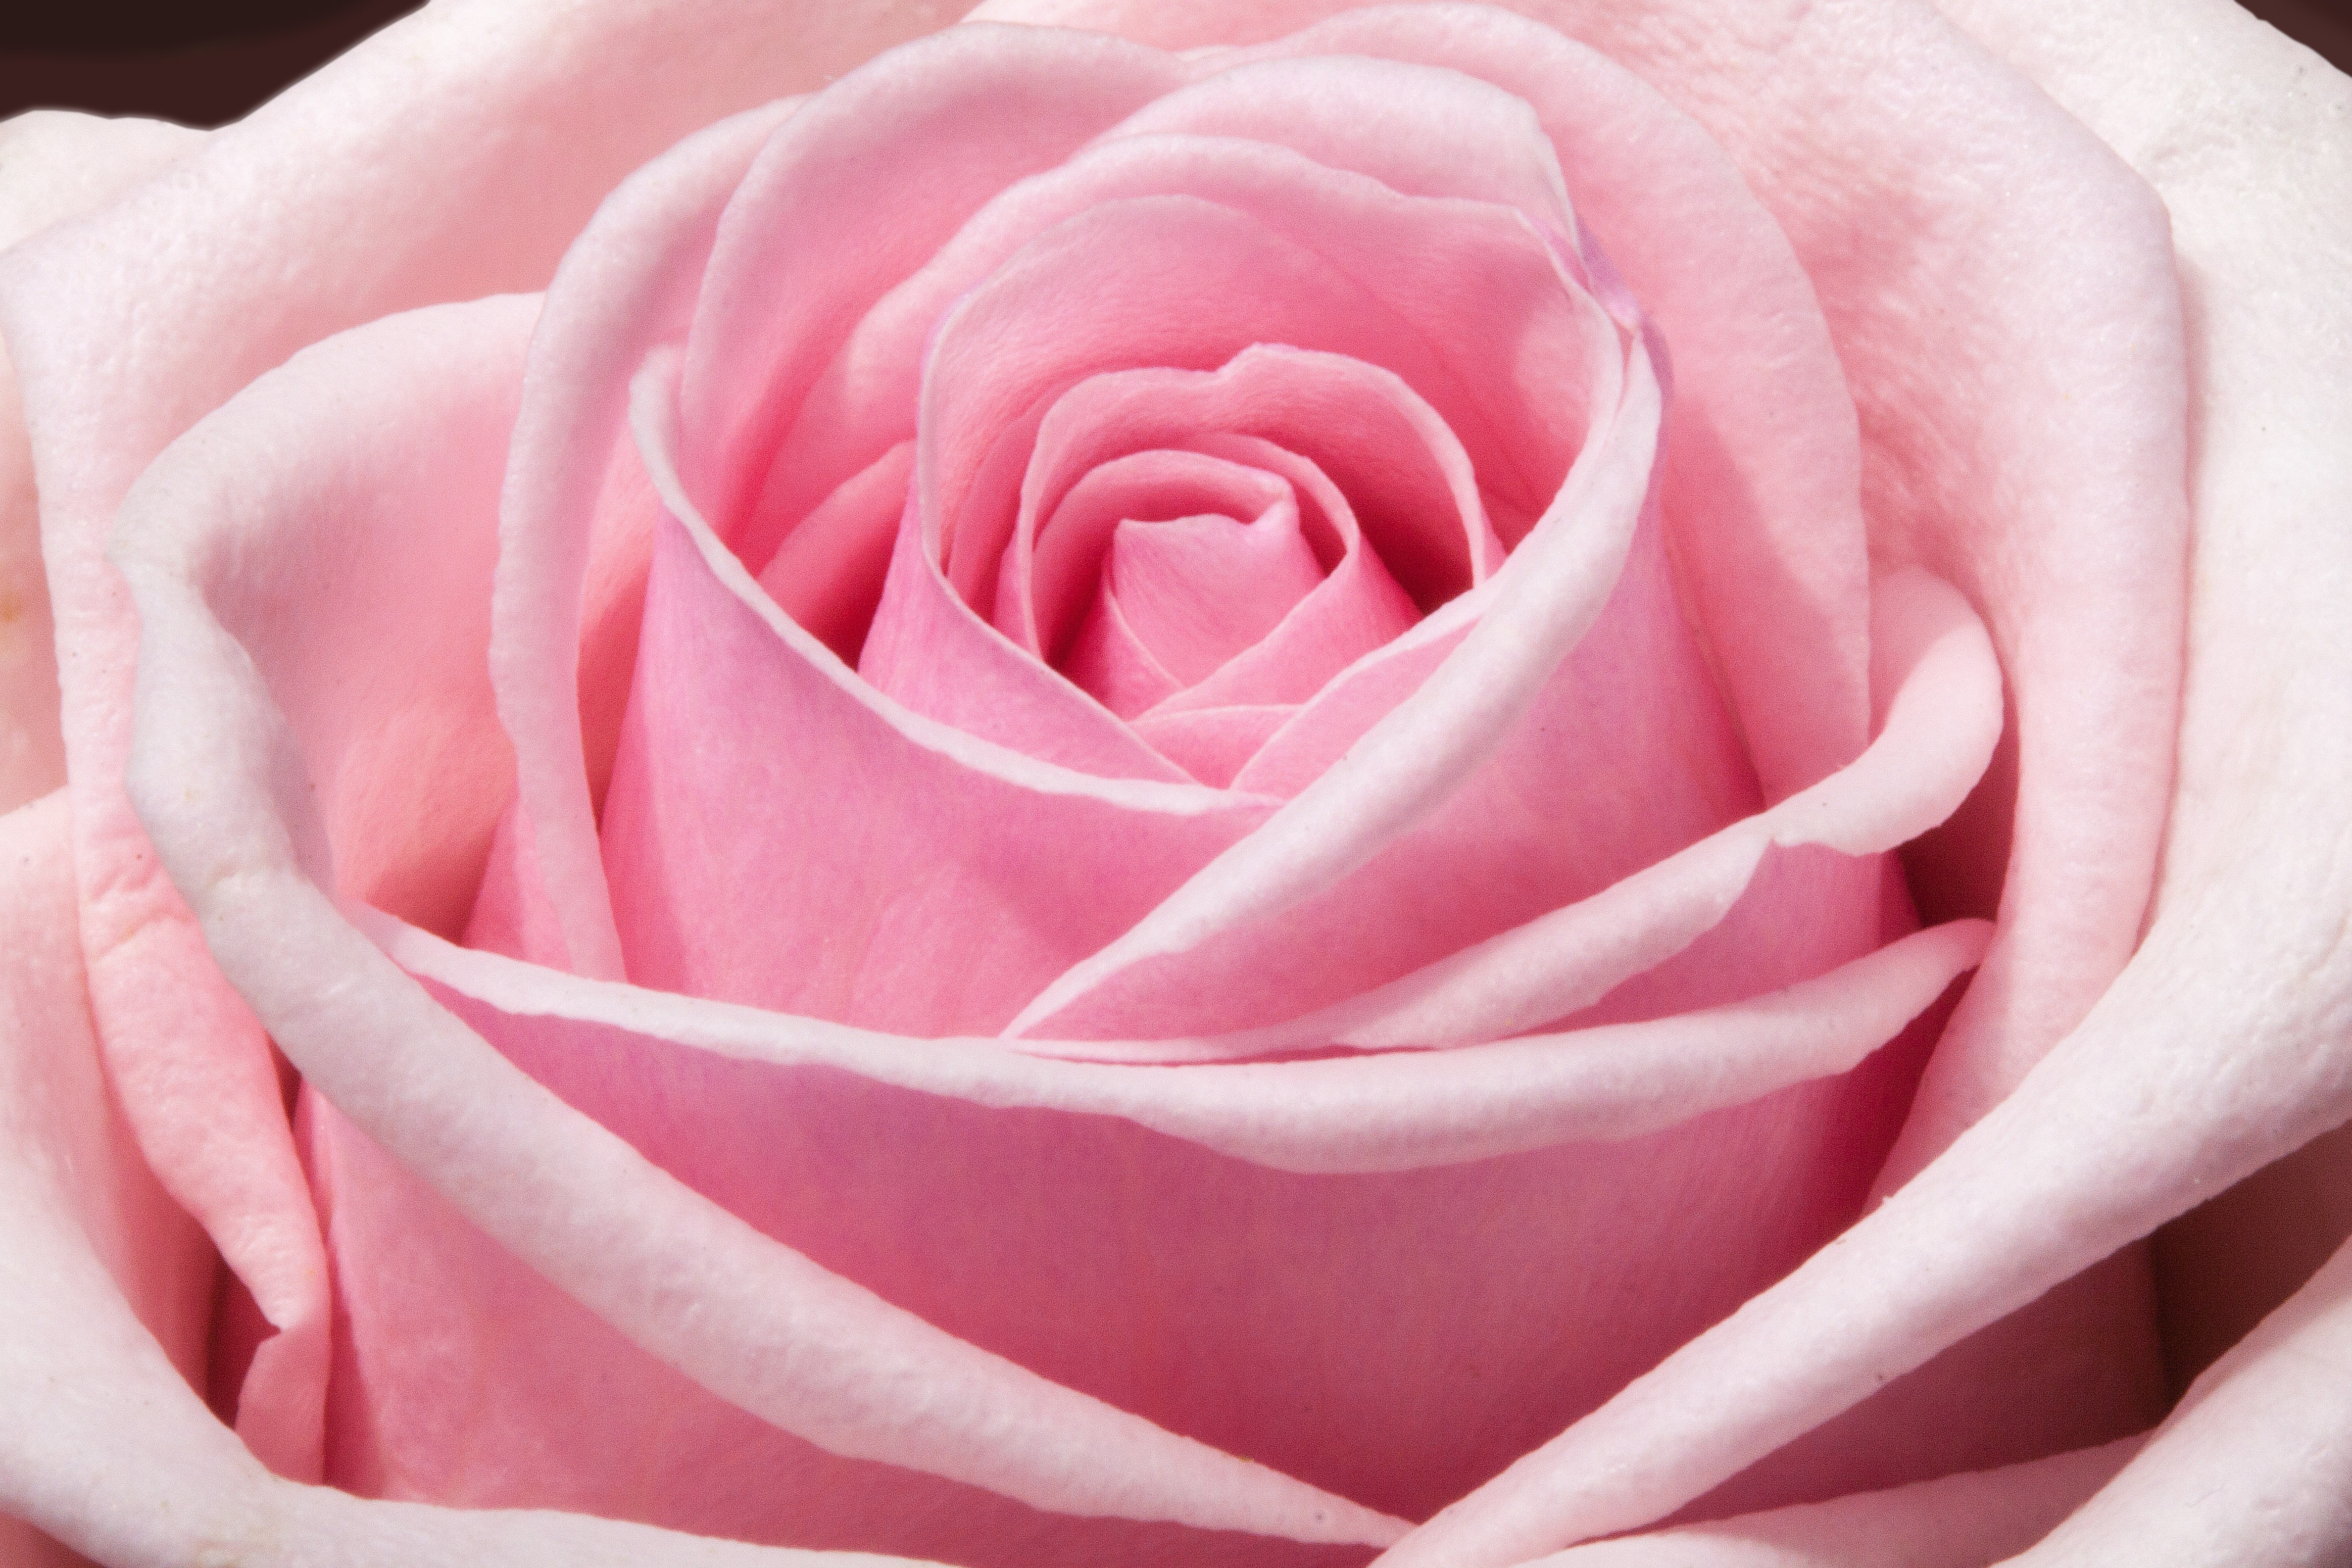 Roses flower Roses photos roses wallpaper for your desktop Red